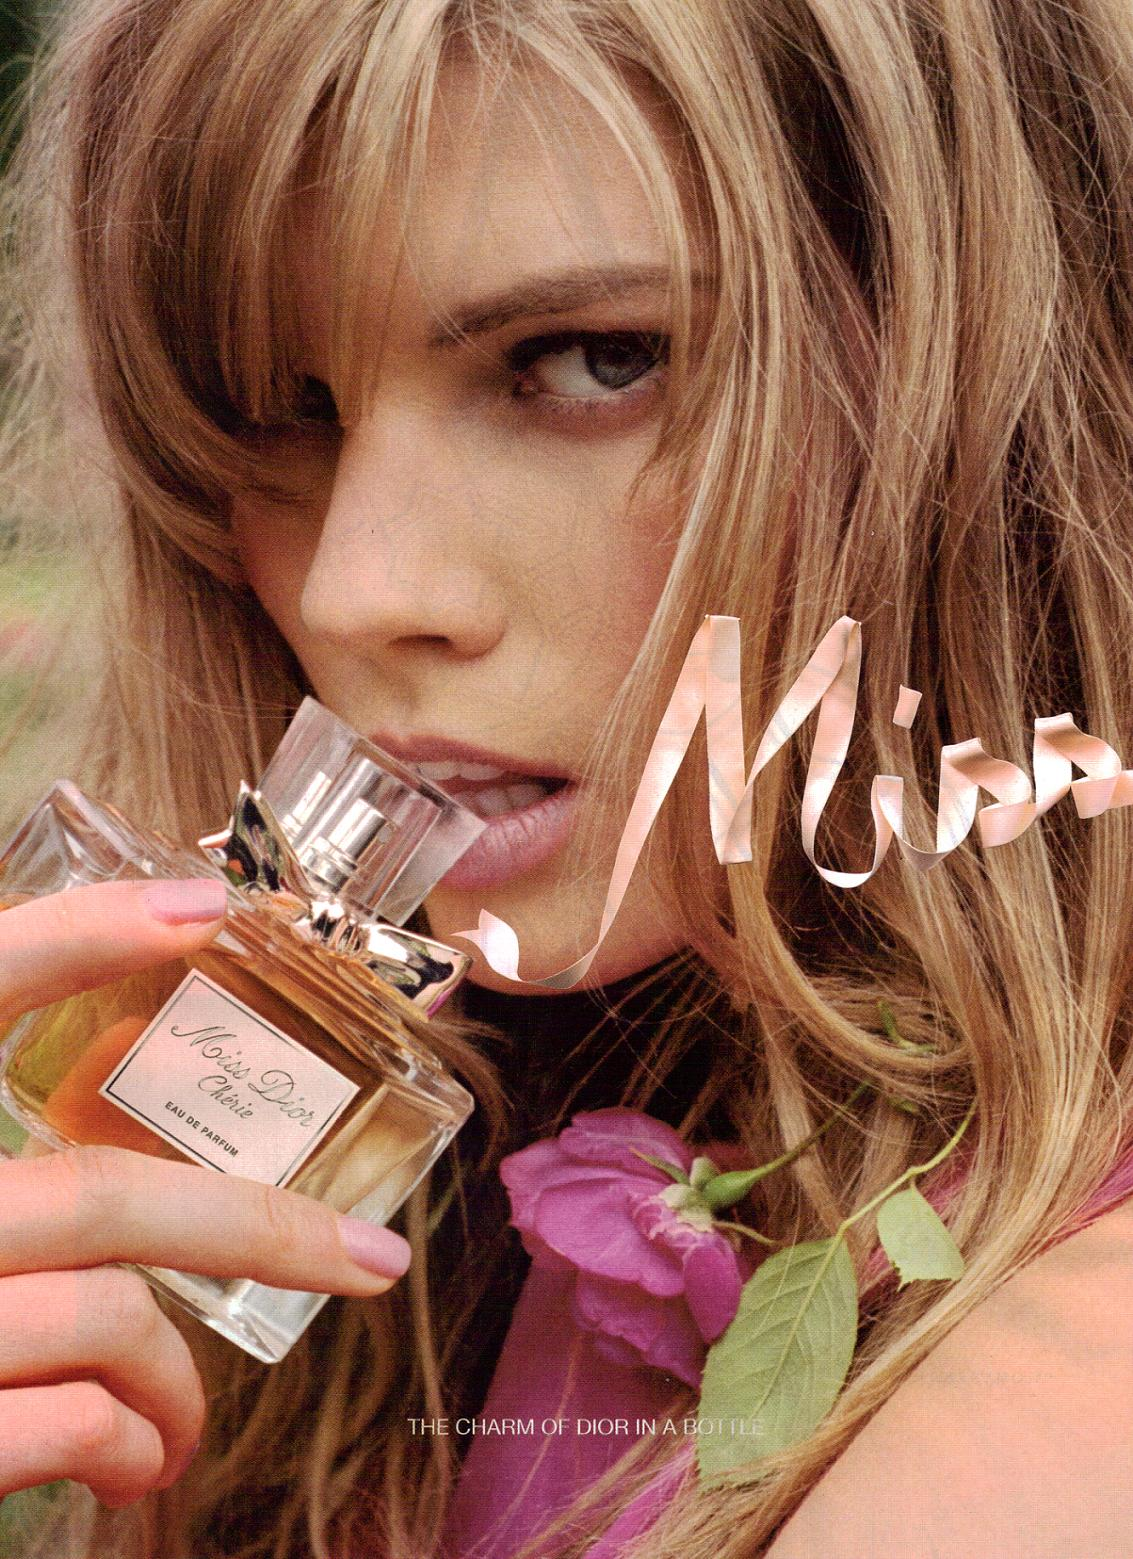 Heart Natural Beauty: Dior girl